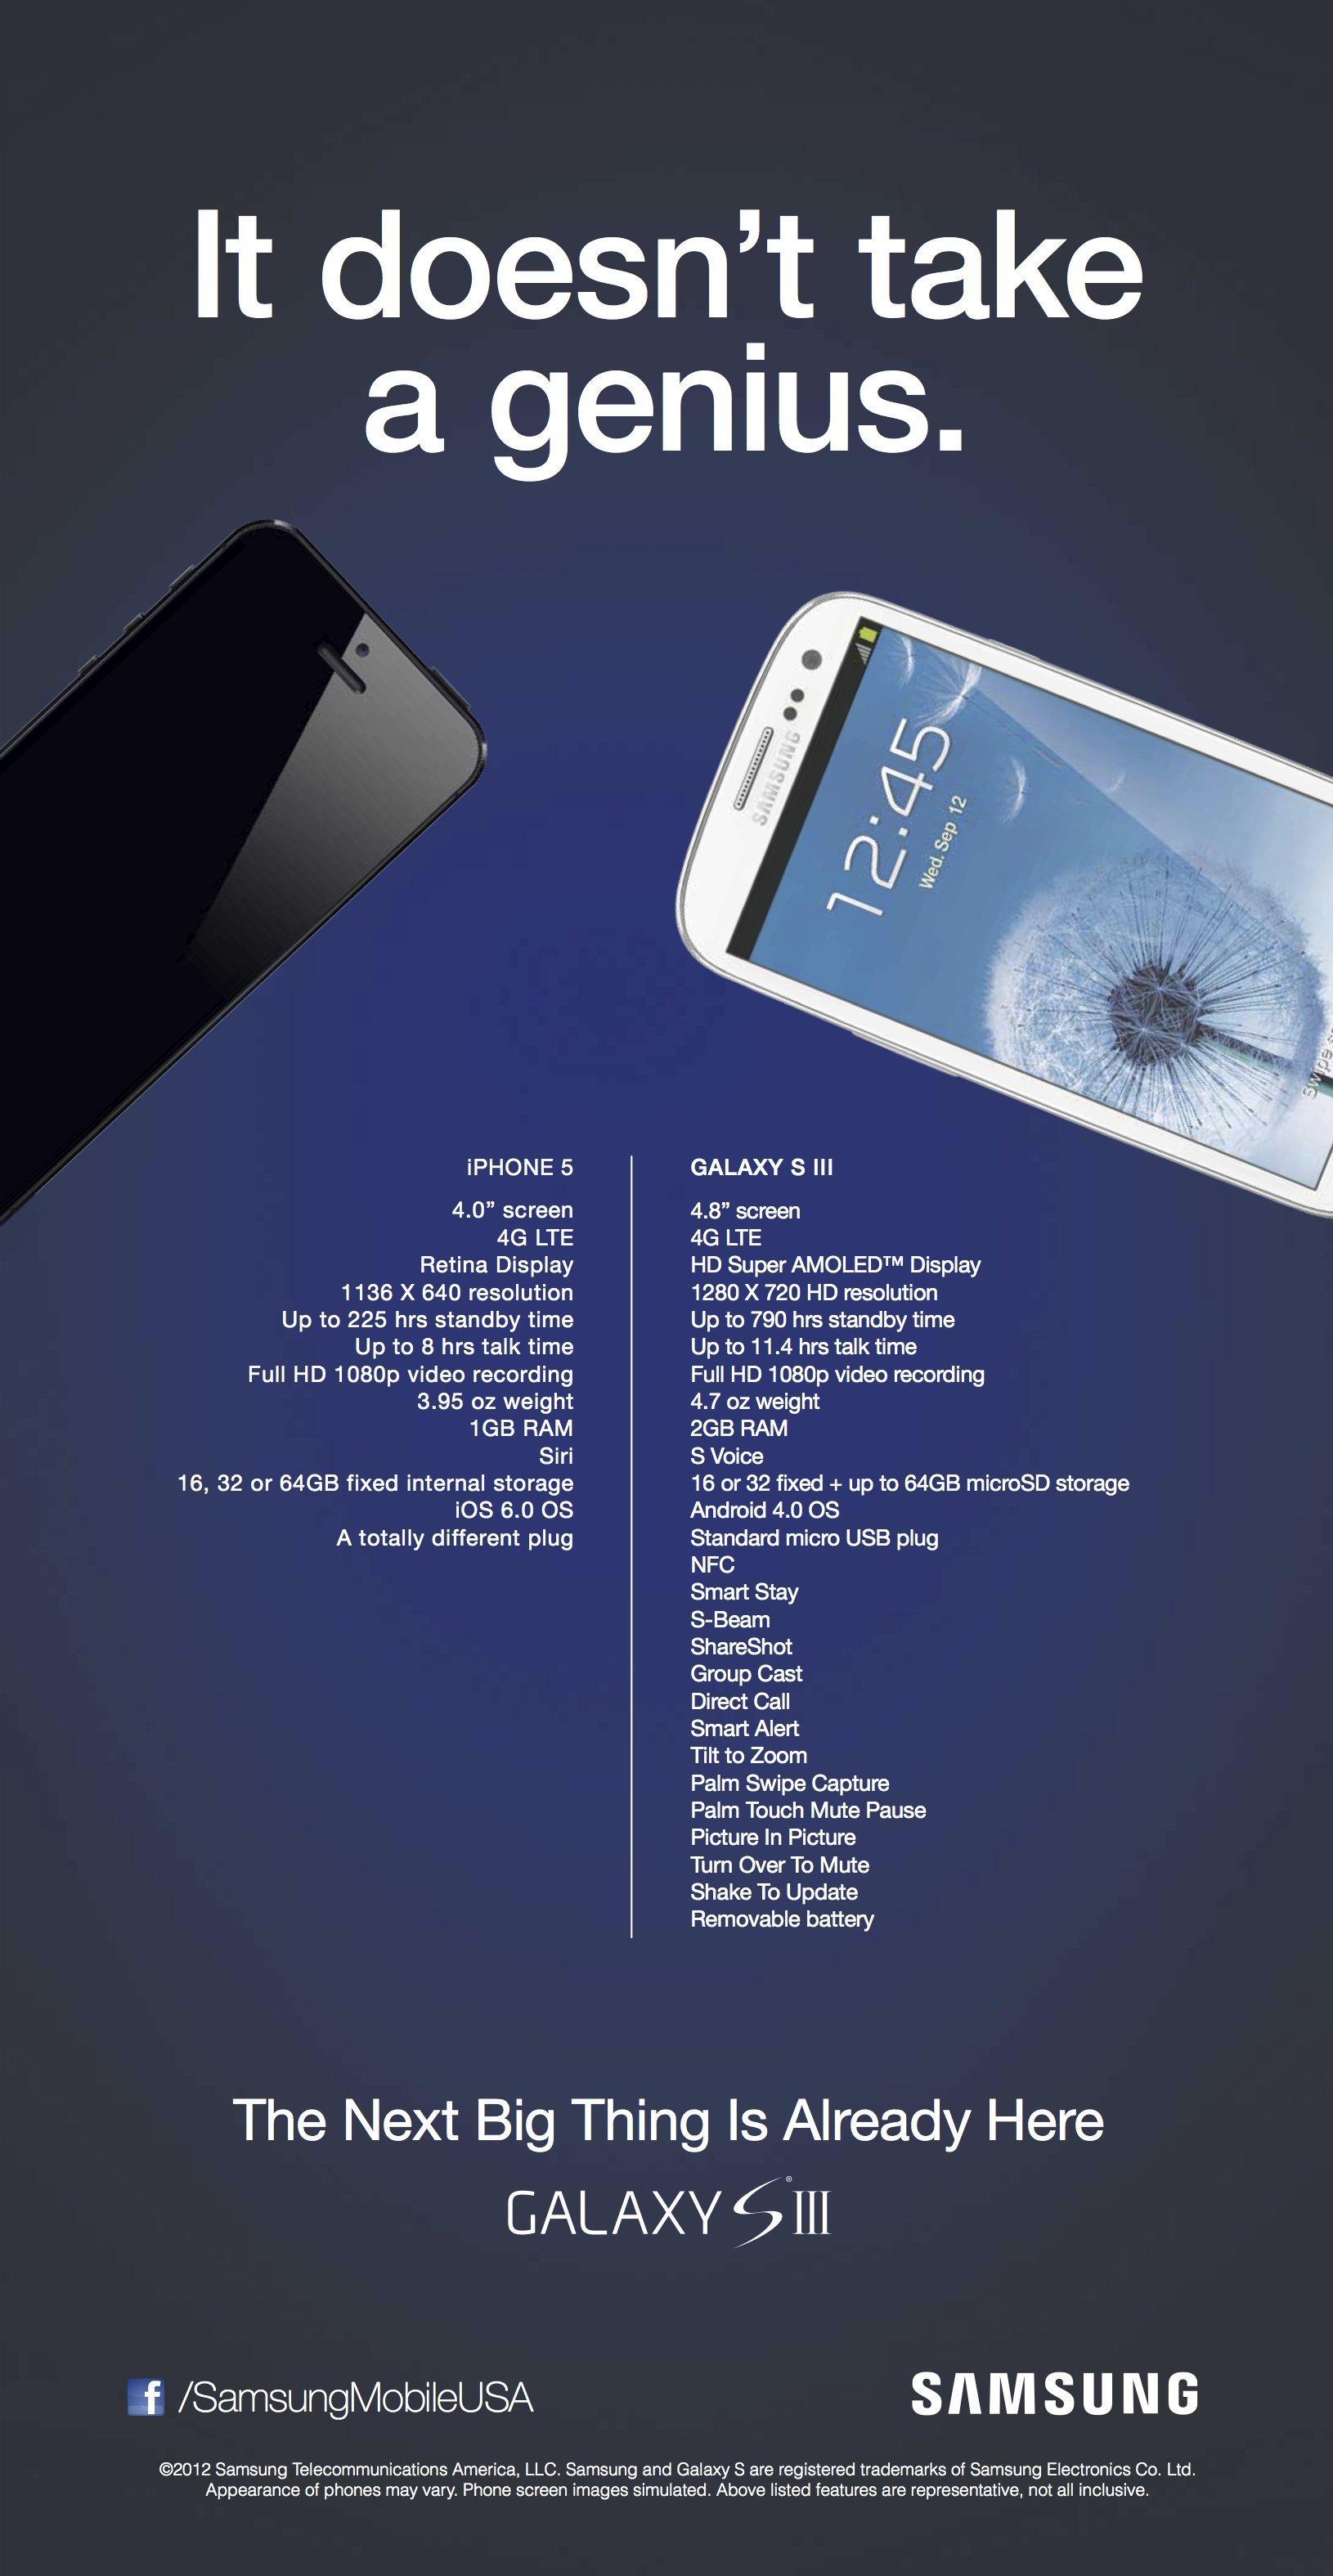 samsung-vs-apple-ad